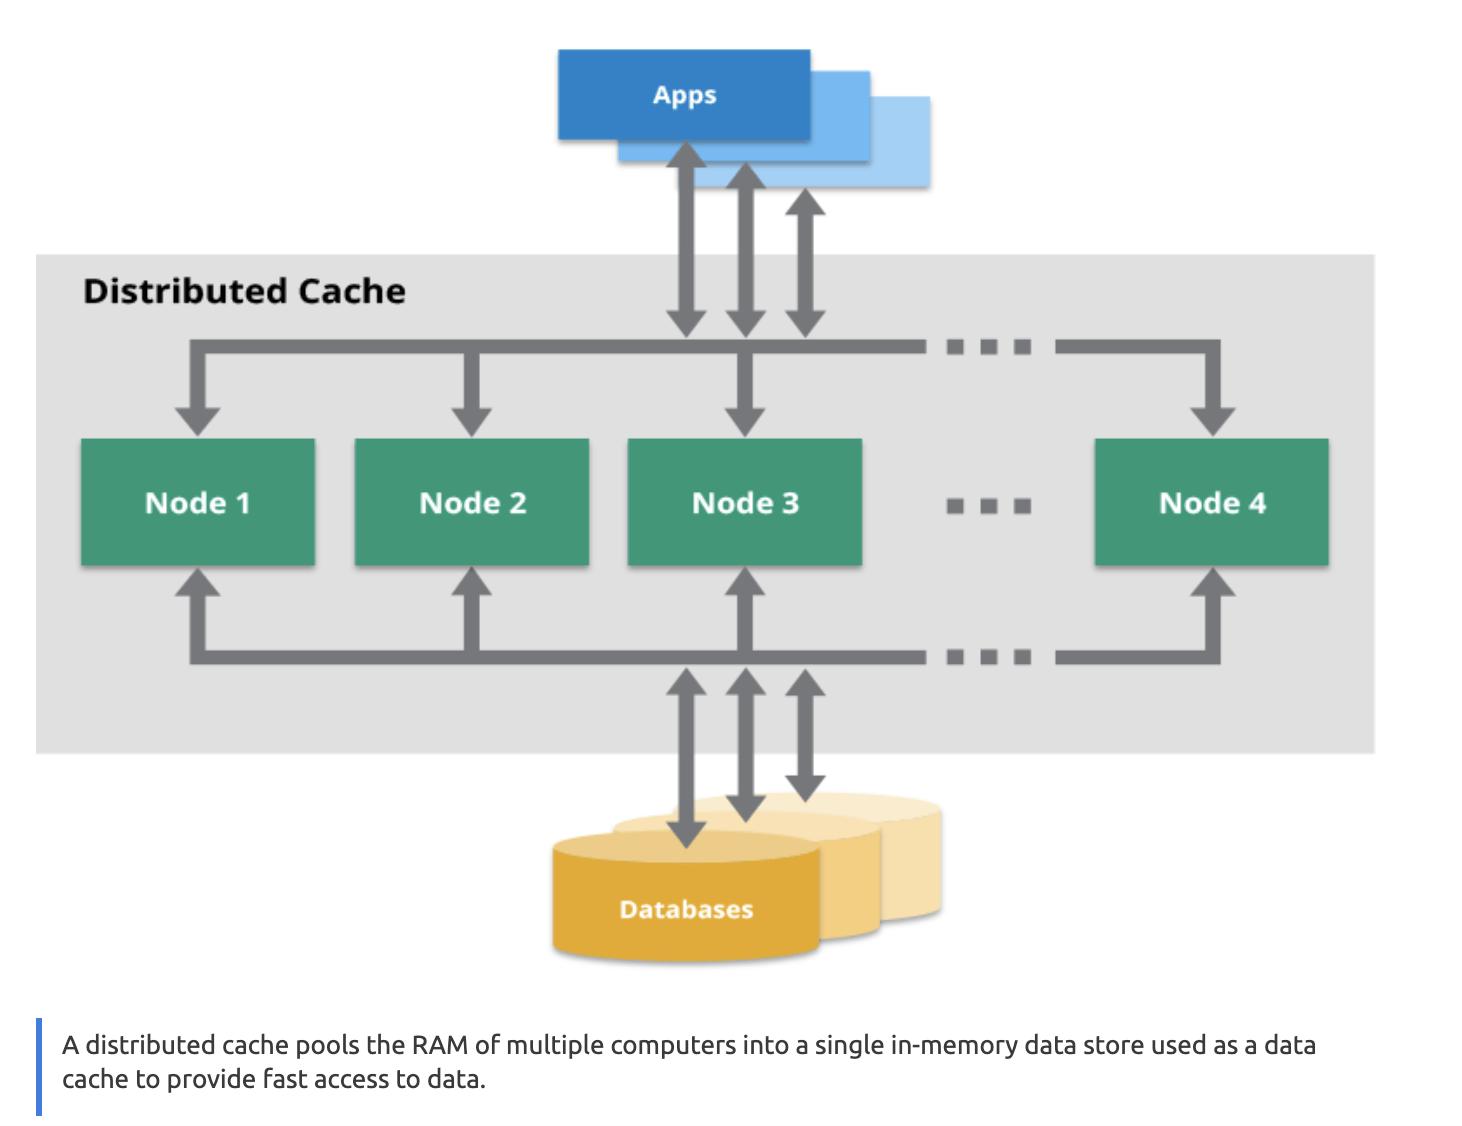 L2 = Hazelcast distributed Cache